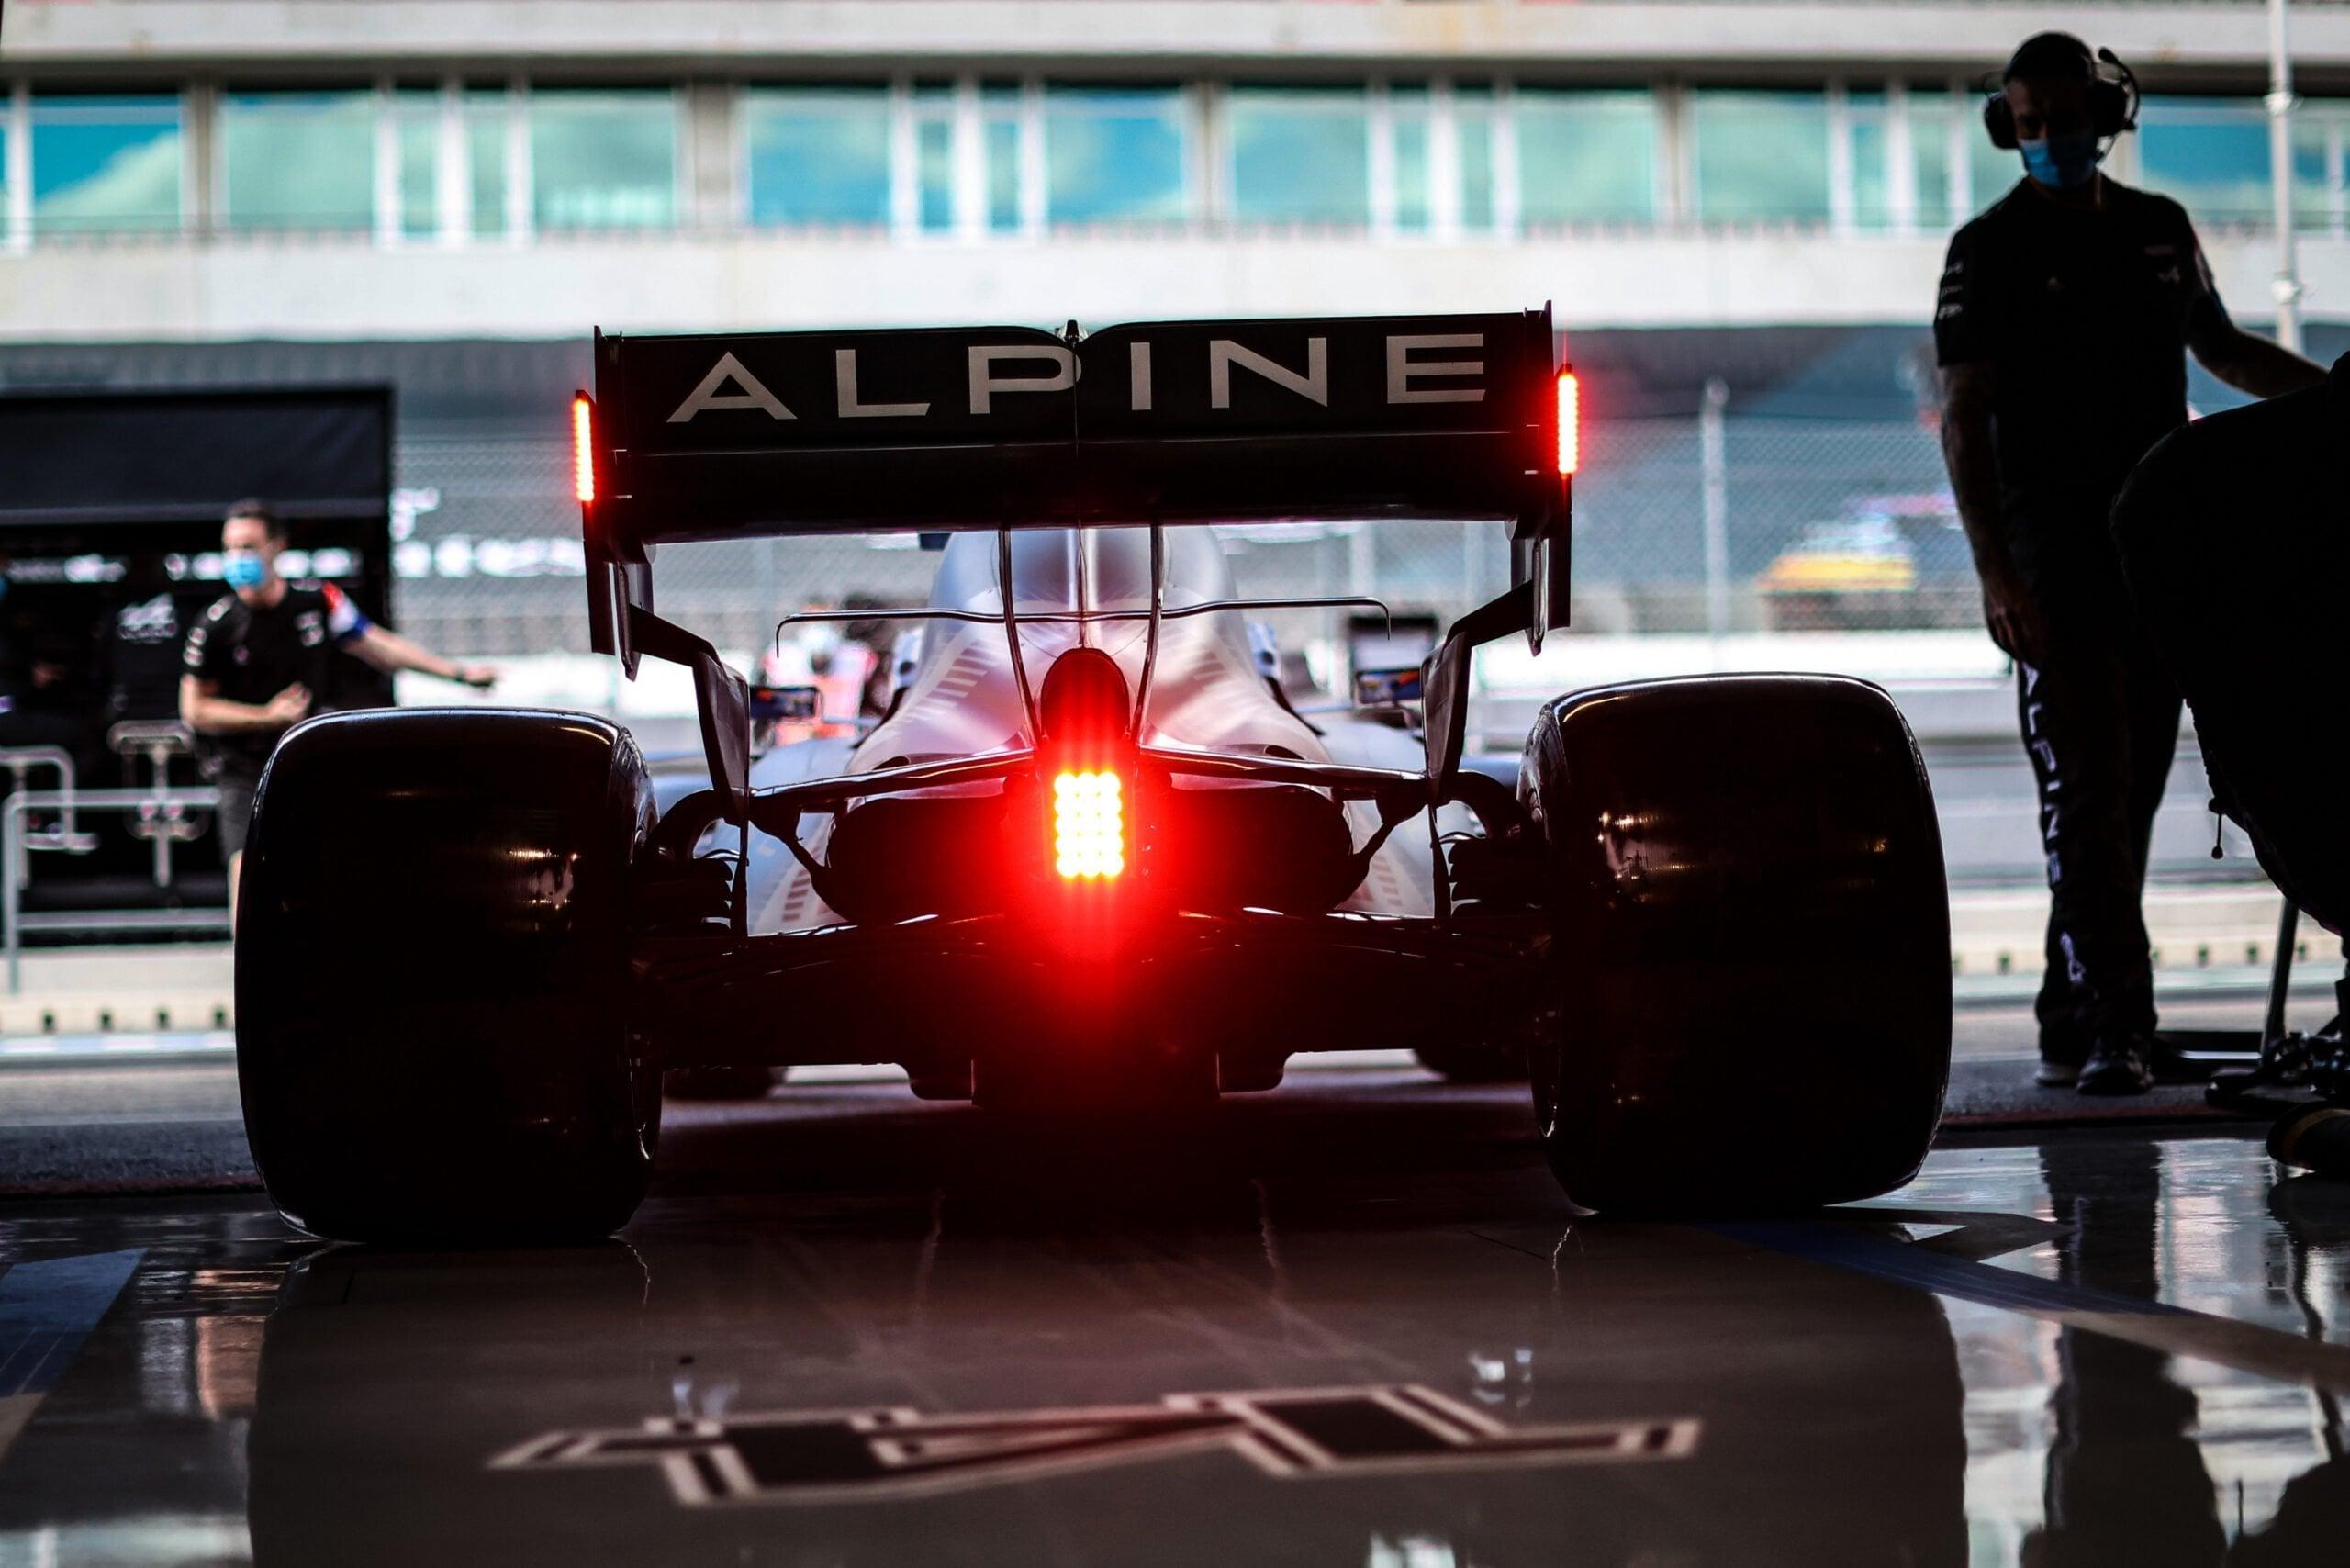 Alpine F1 Team GRAND PRIX HEINEKEN DU PORTUGAL Alonso Ocon 2021 A521 7 scaled   Alpine F1 Team : des essais convaincants au Grand Prix Heineken du Portugal